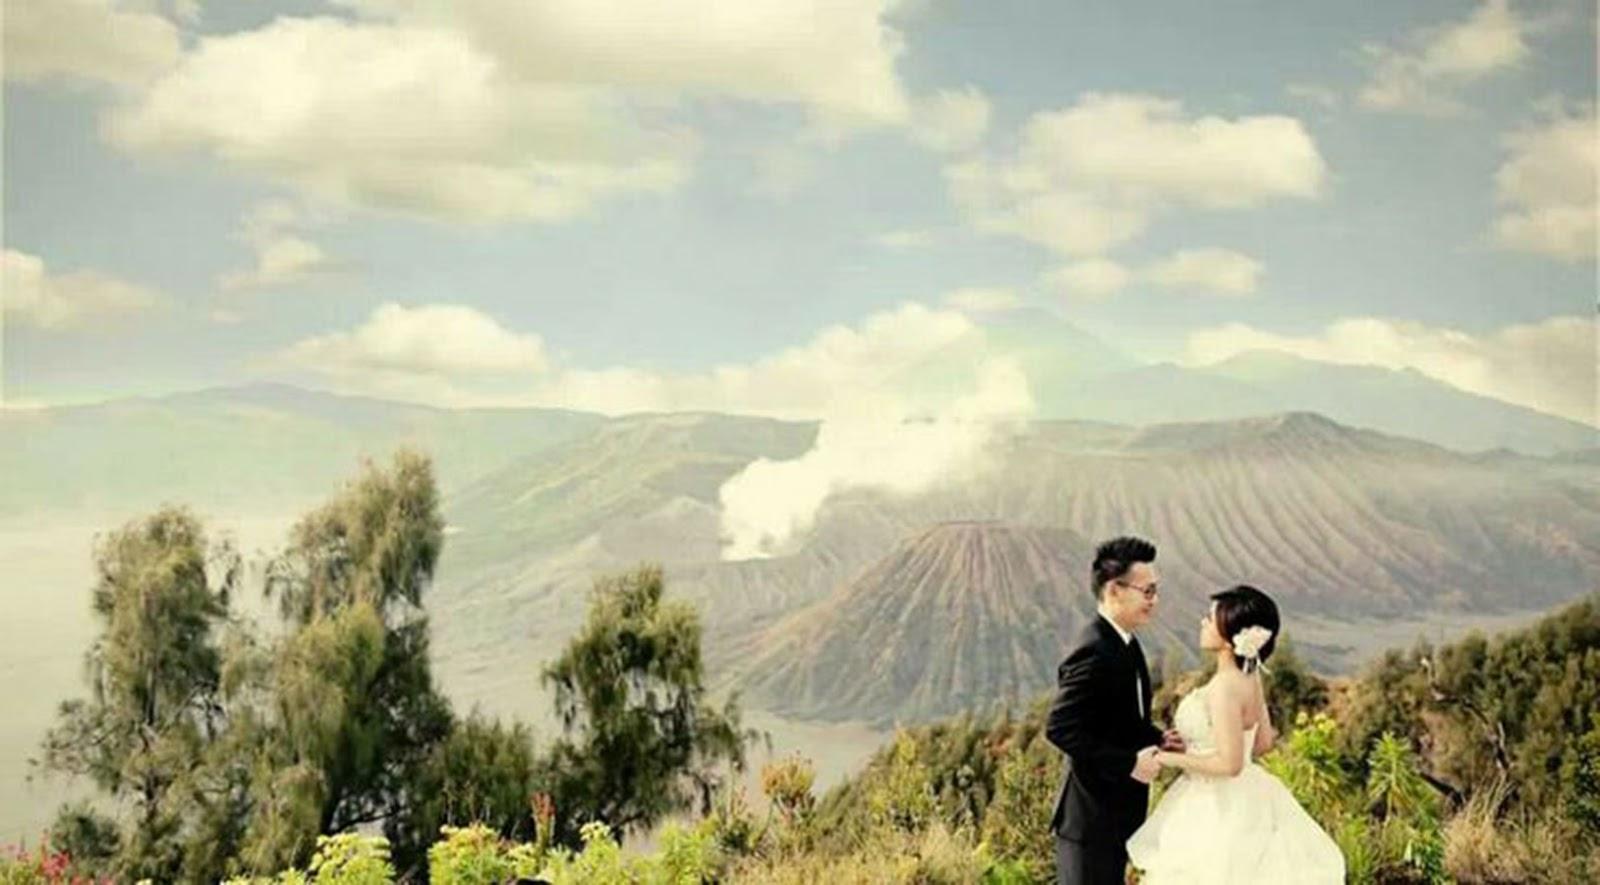 10 Best Foto Prewedding Jogja Paket Foto Pre Wedding: Pilih 10 Lokasi Outdoor Prewedding Terbaik Indonesia Kamu